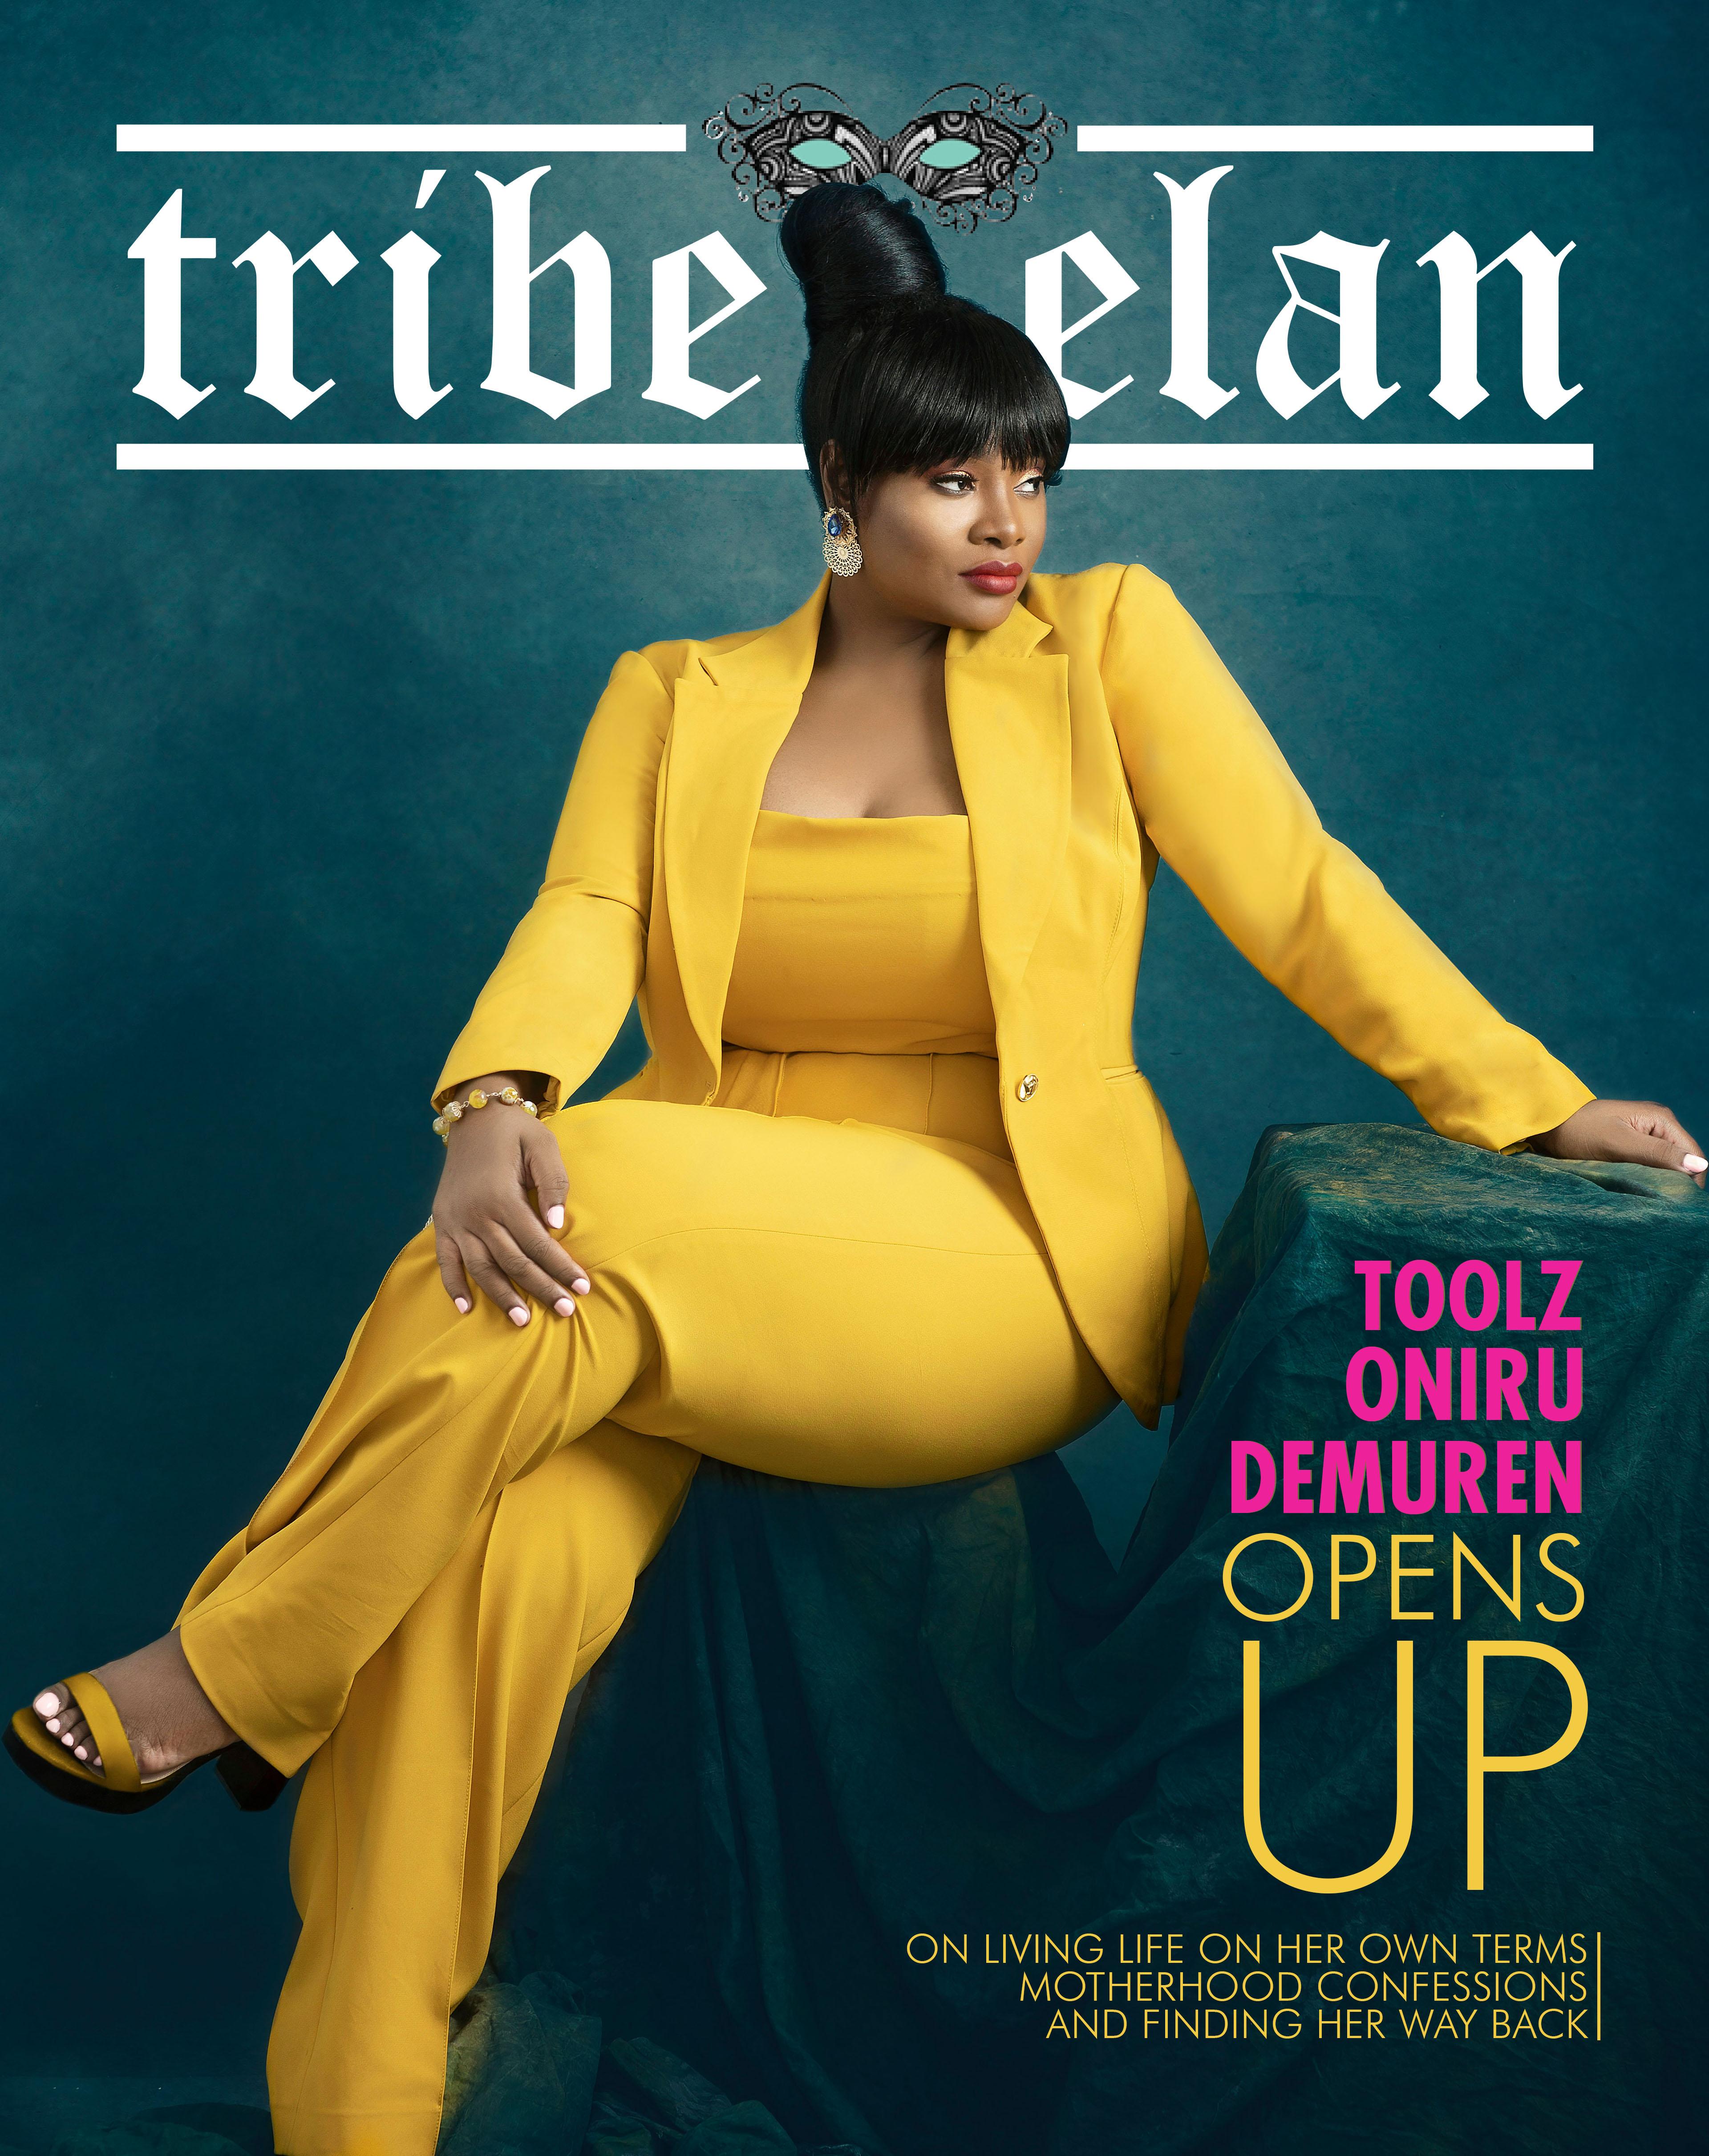 Toolz Oniru-Demuren shines on Tribe & Elan Magazine's New Issue